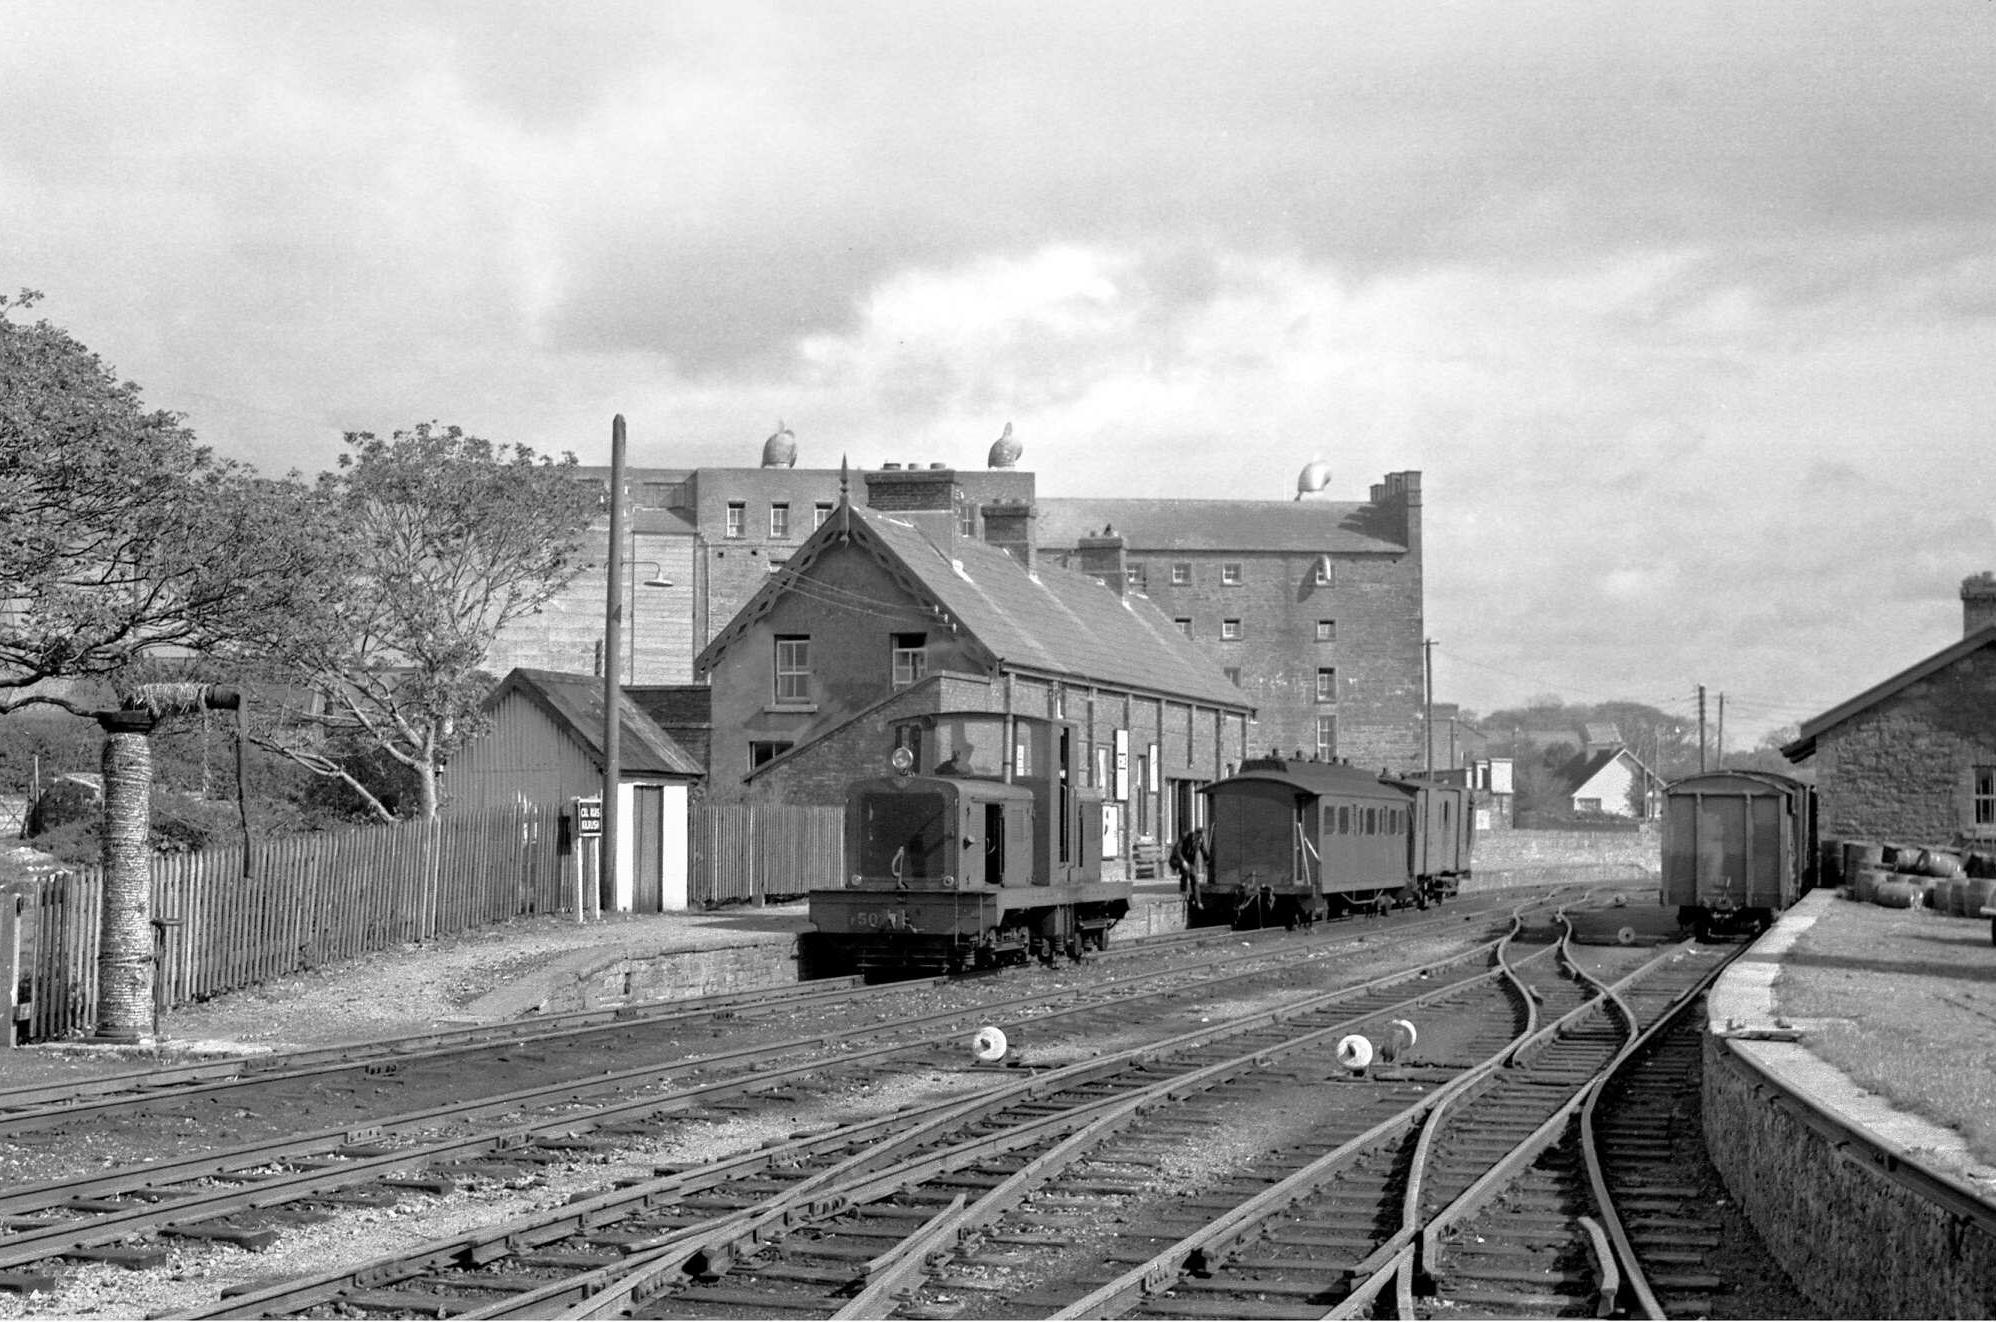 BtbJNtNIgAAE Yr?format=jpg&name=large - The West Clare's modernisation era